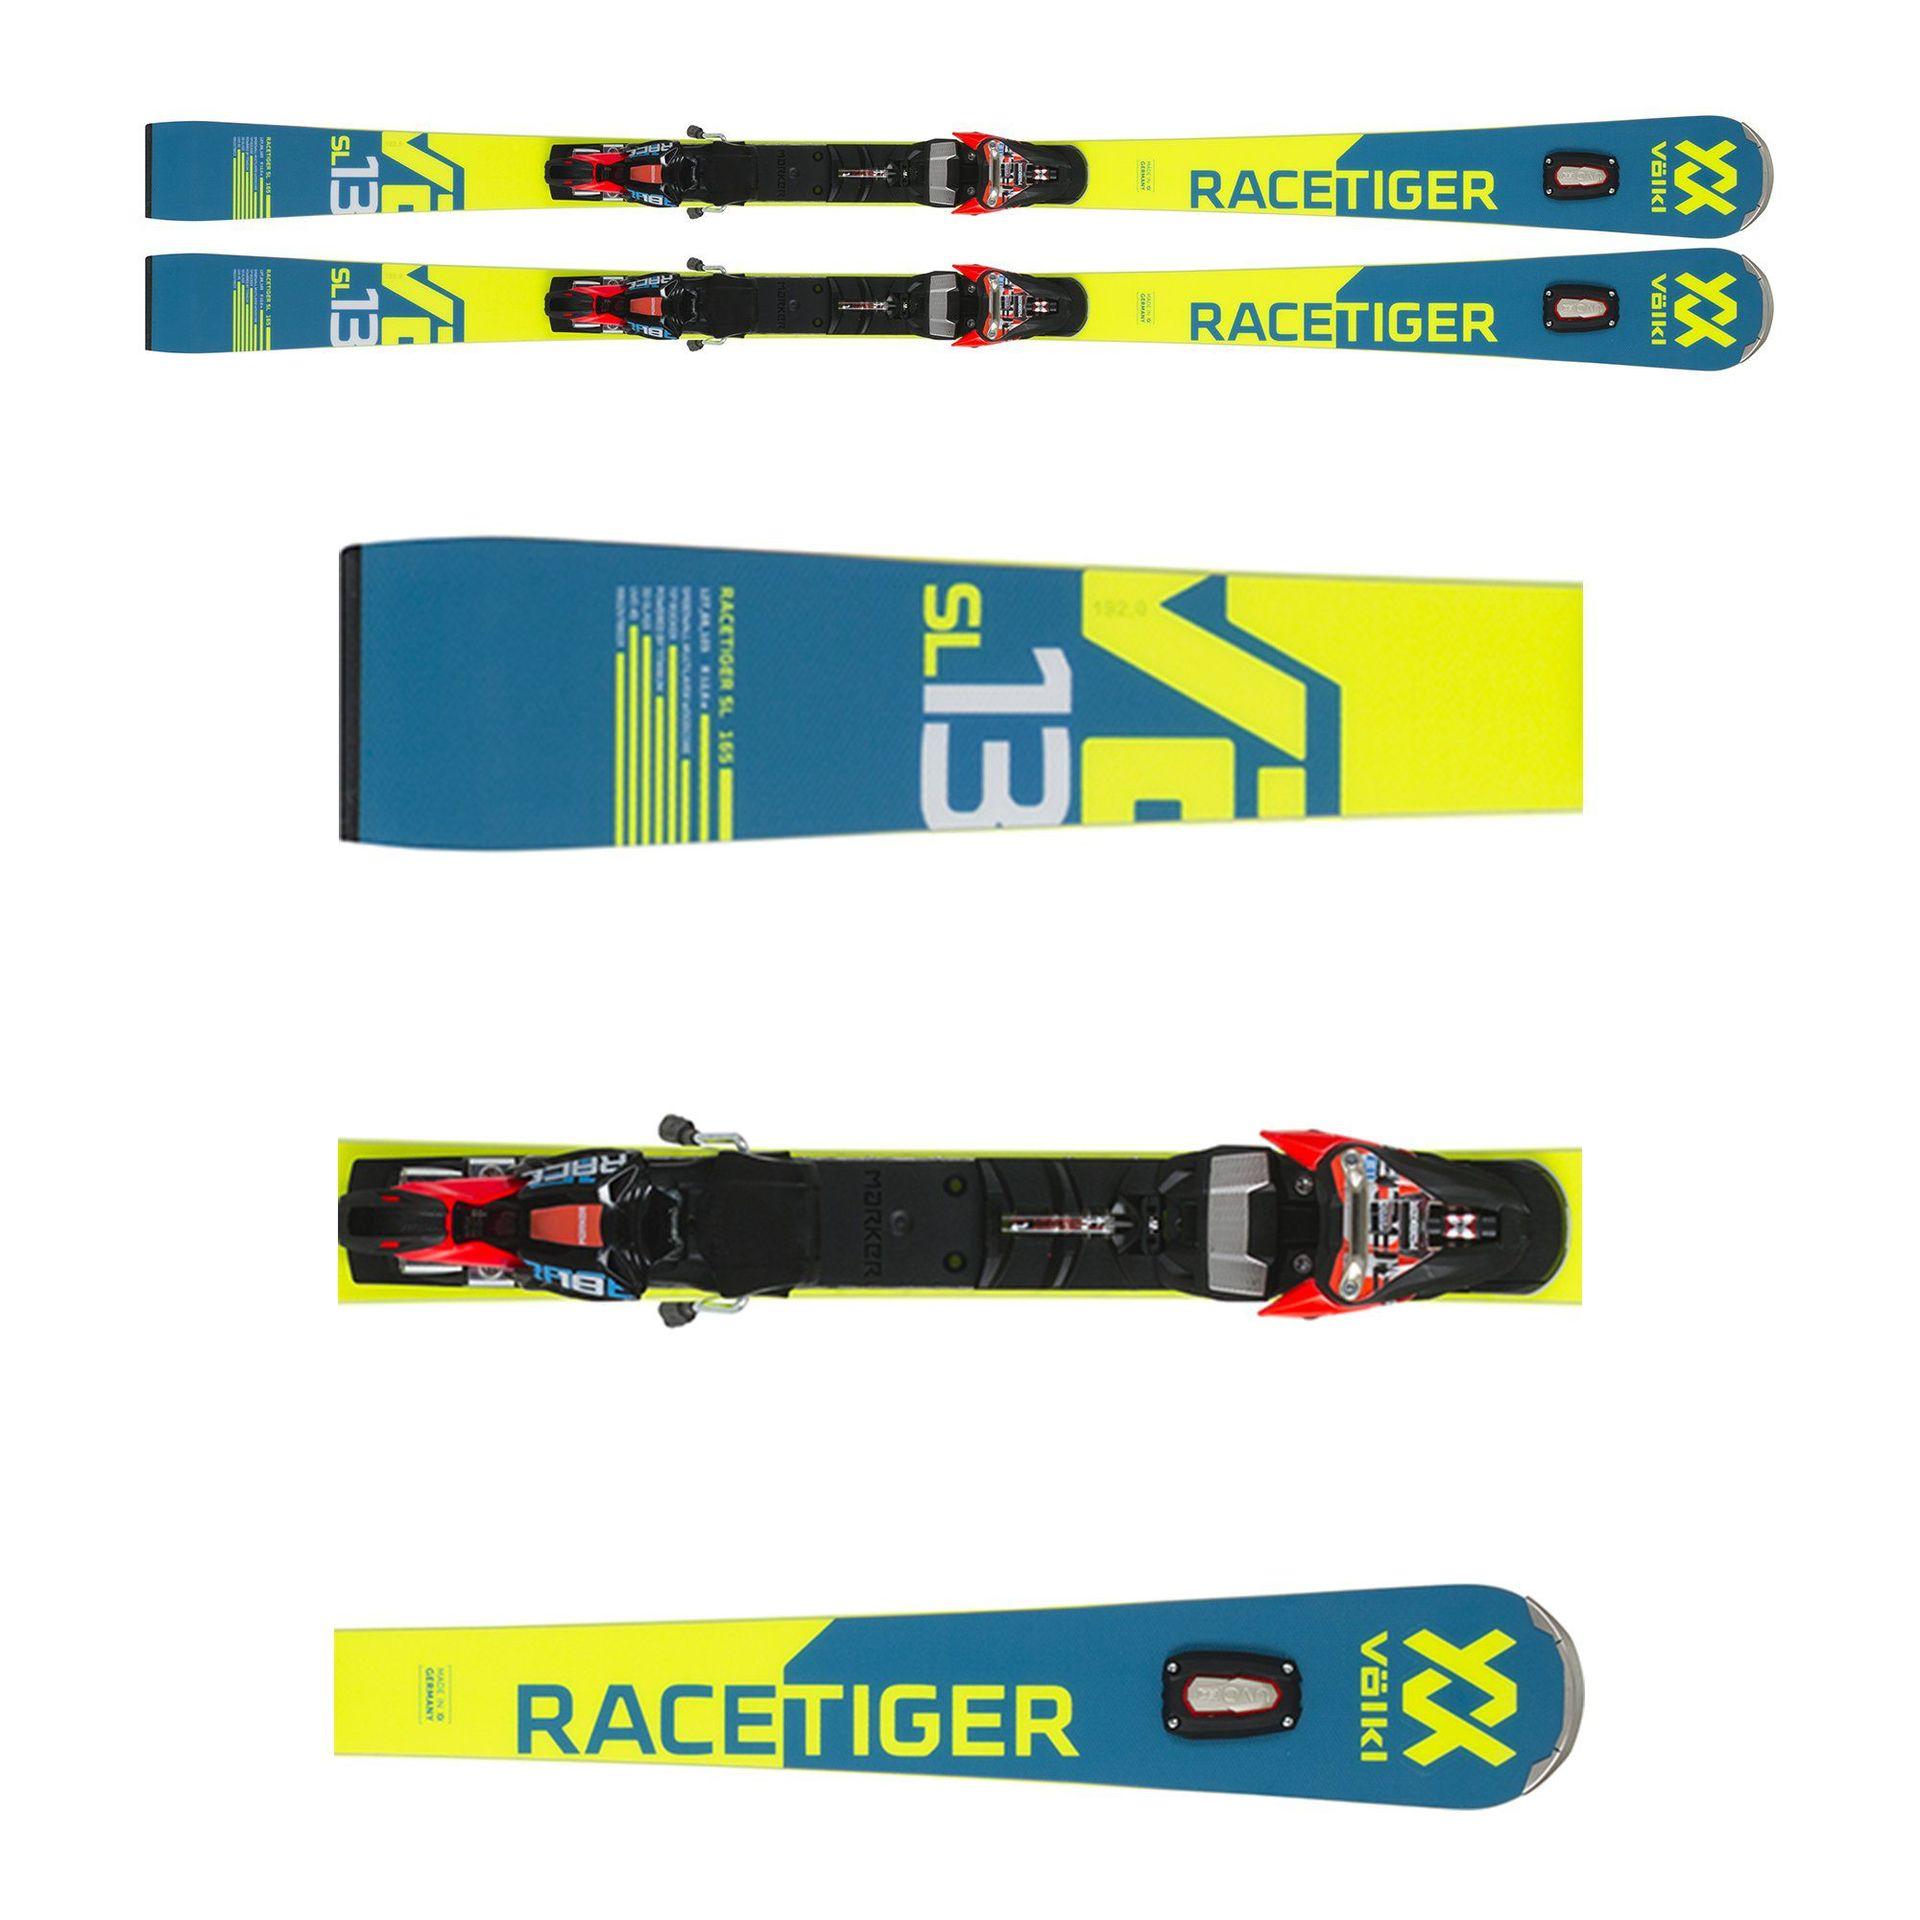 NARTY VOLKL RACETIGER SL PRO 118031